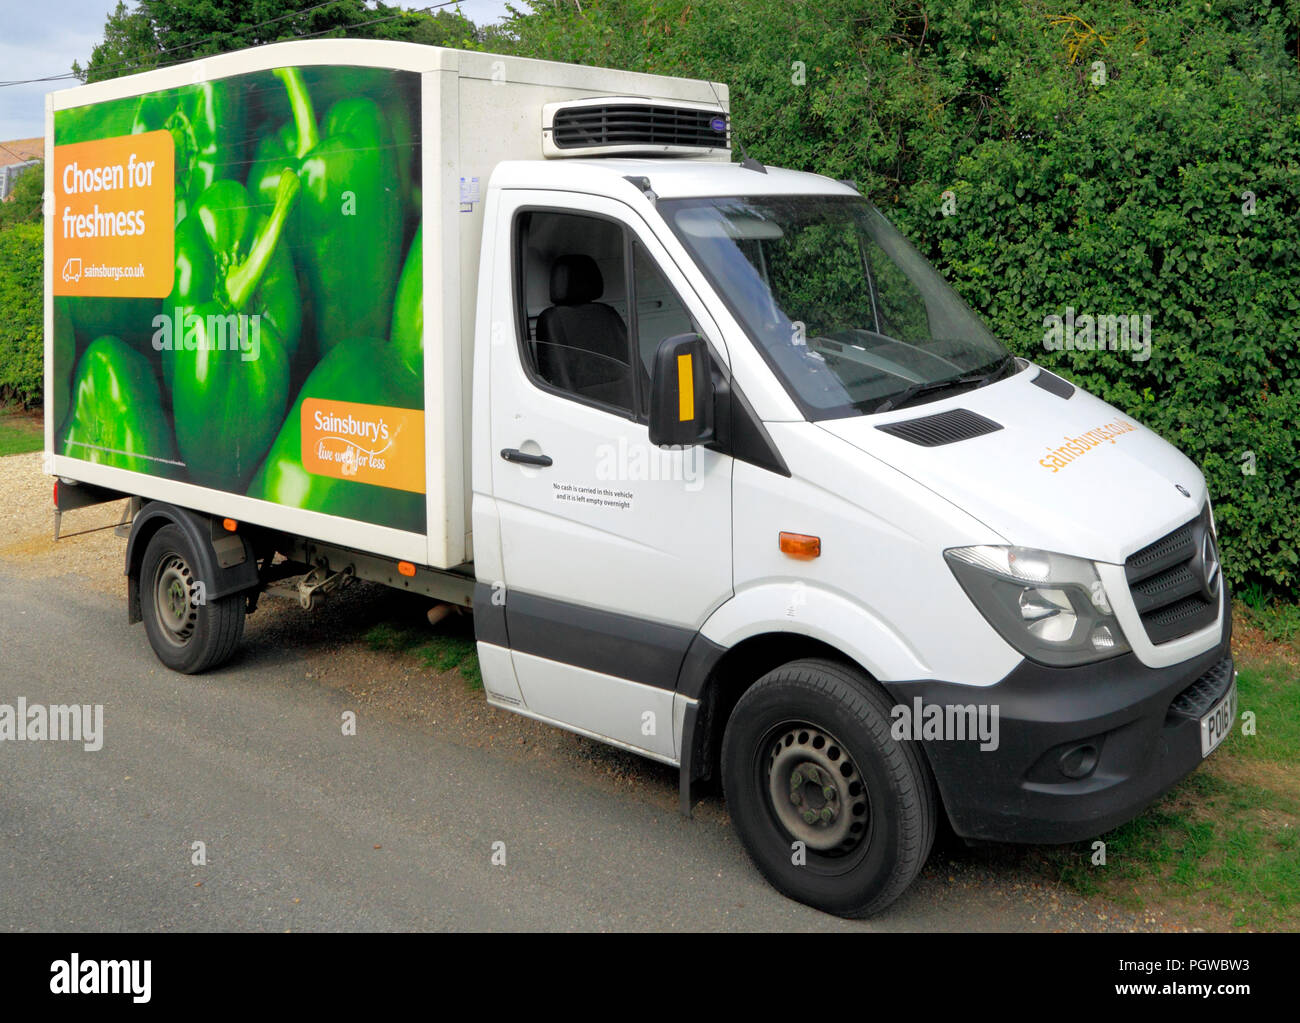 Sainsbury's Supermarkt, online Versand, Fahrzeug, Van, England, UK, Sainsburys Stockbild